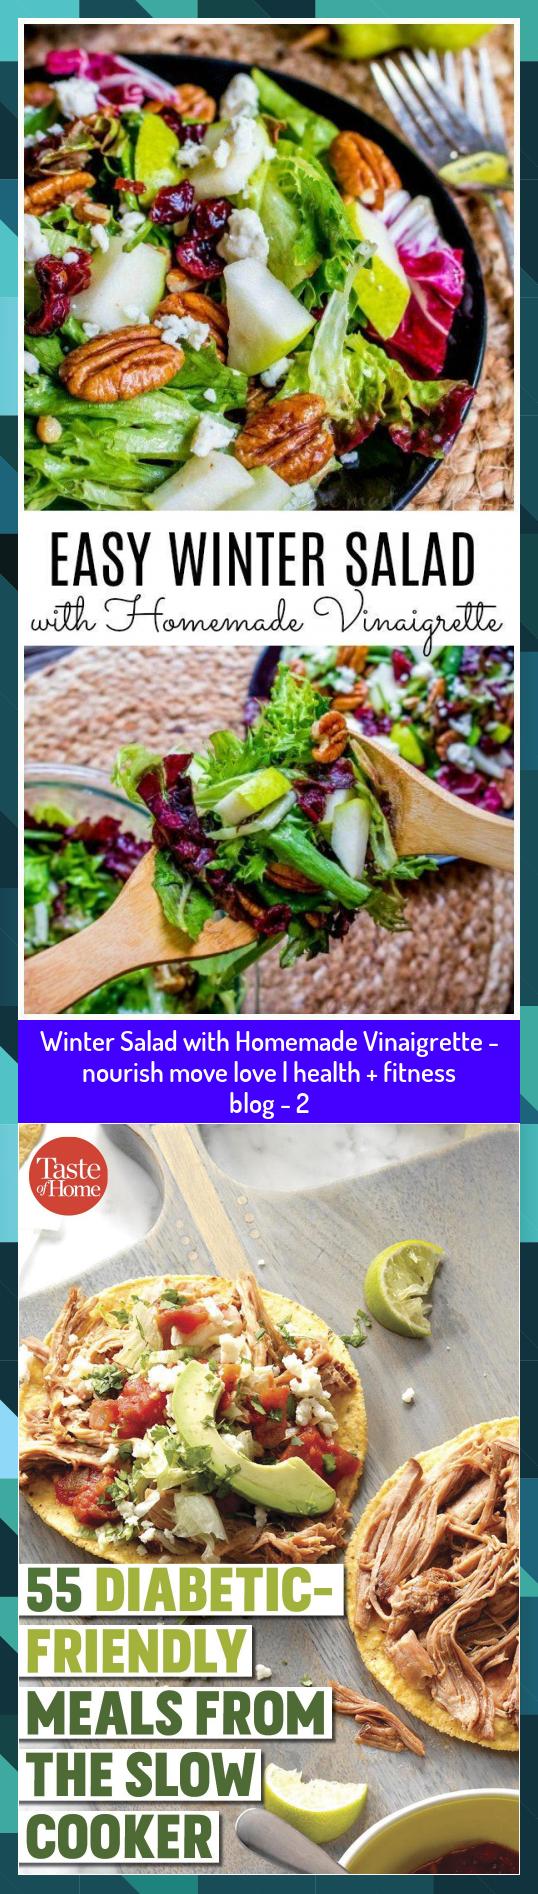 Winter Salad with Homemade Vinaigrette - nourish move love | health + fitness blog - 2 #blog #fitnes...